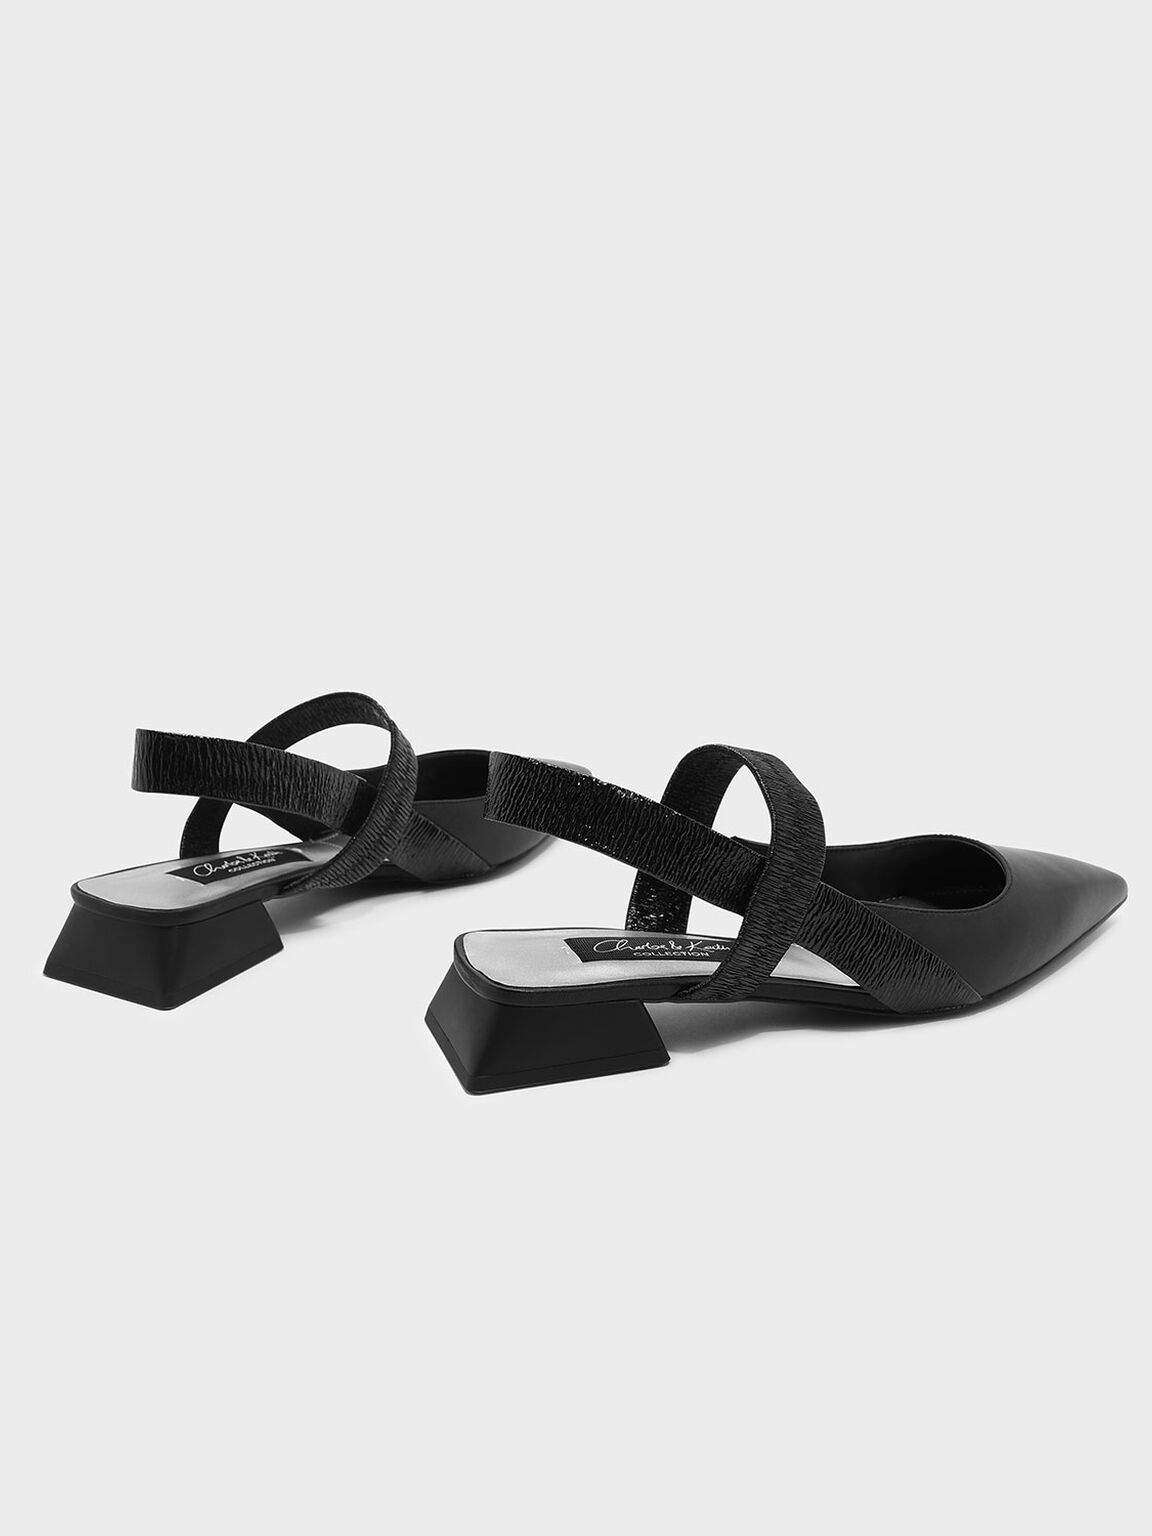 Mary Jane Leather Slingback Sandals, Black, hi-res